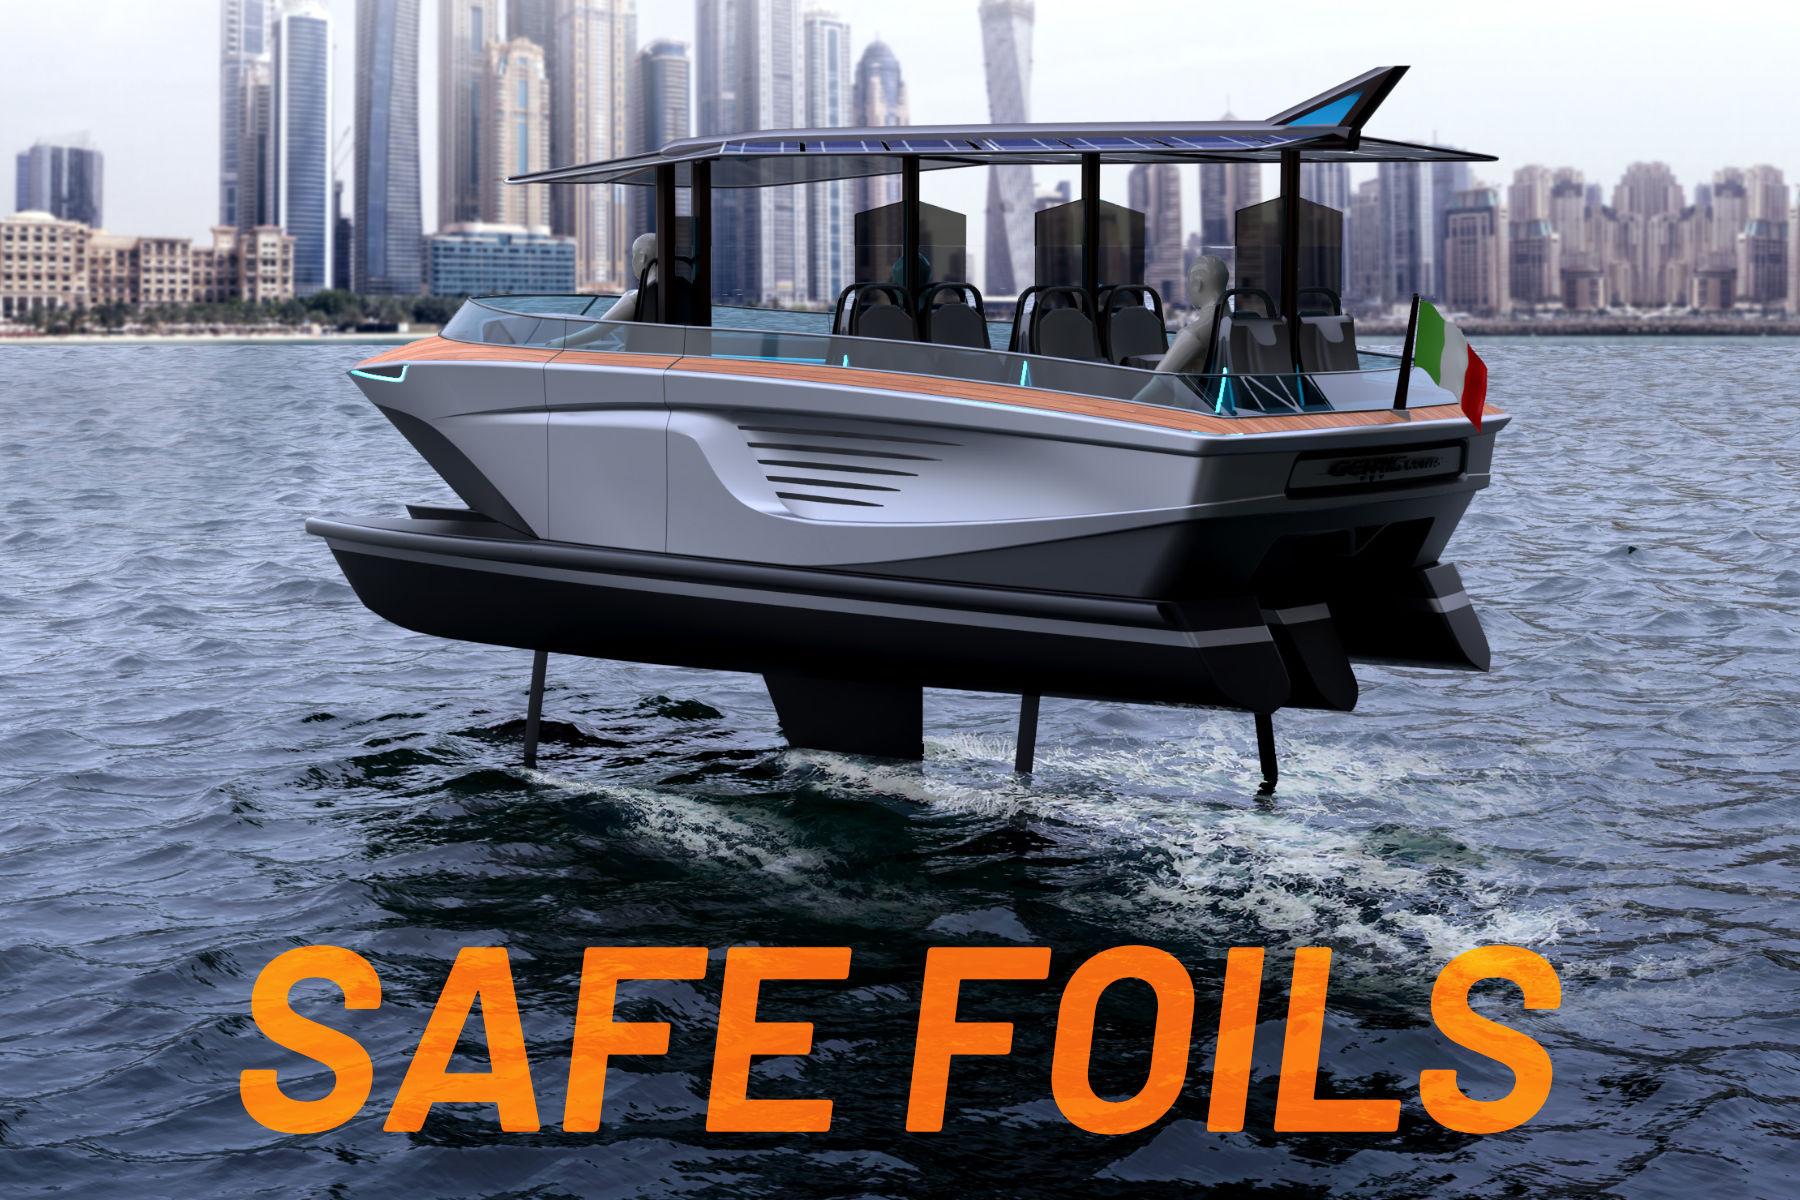 Gerrisboats: scafi ad alta tecnologia e Safe Foils